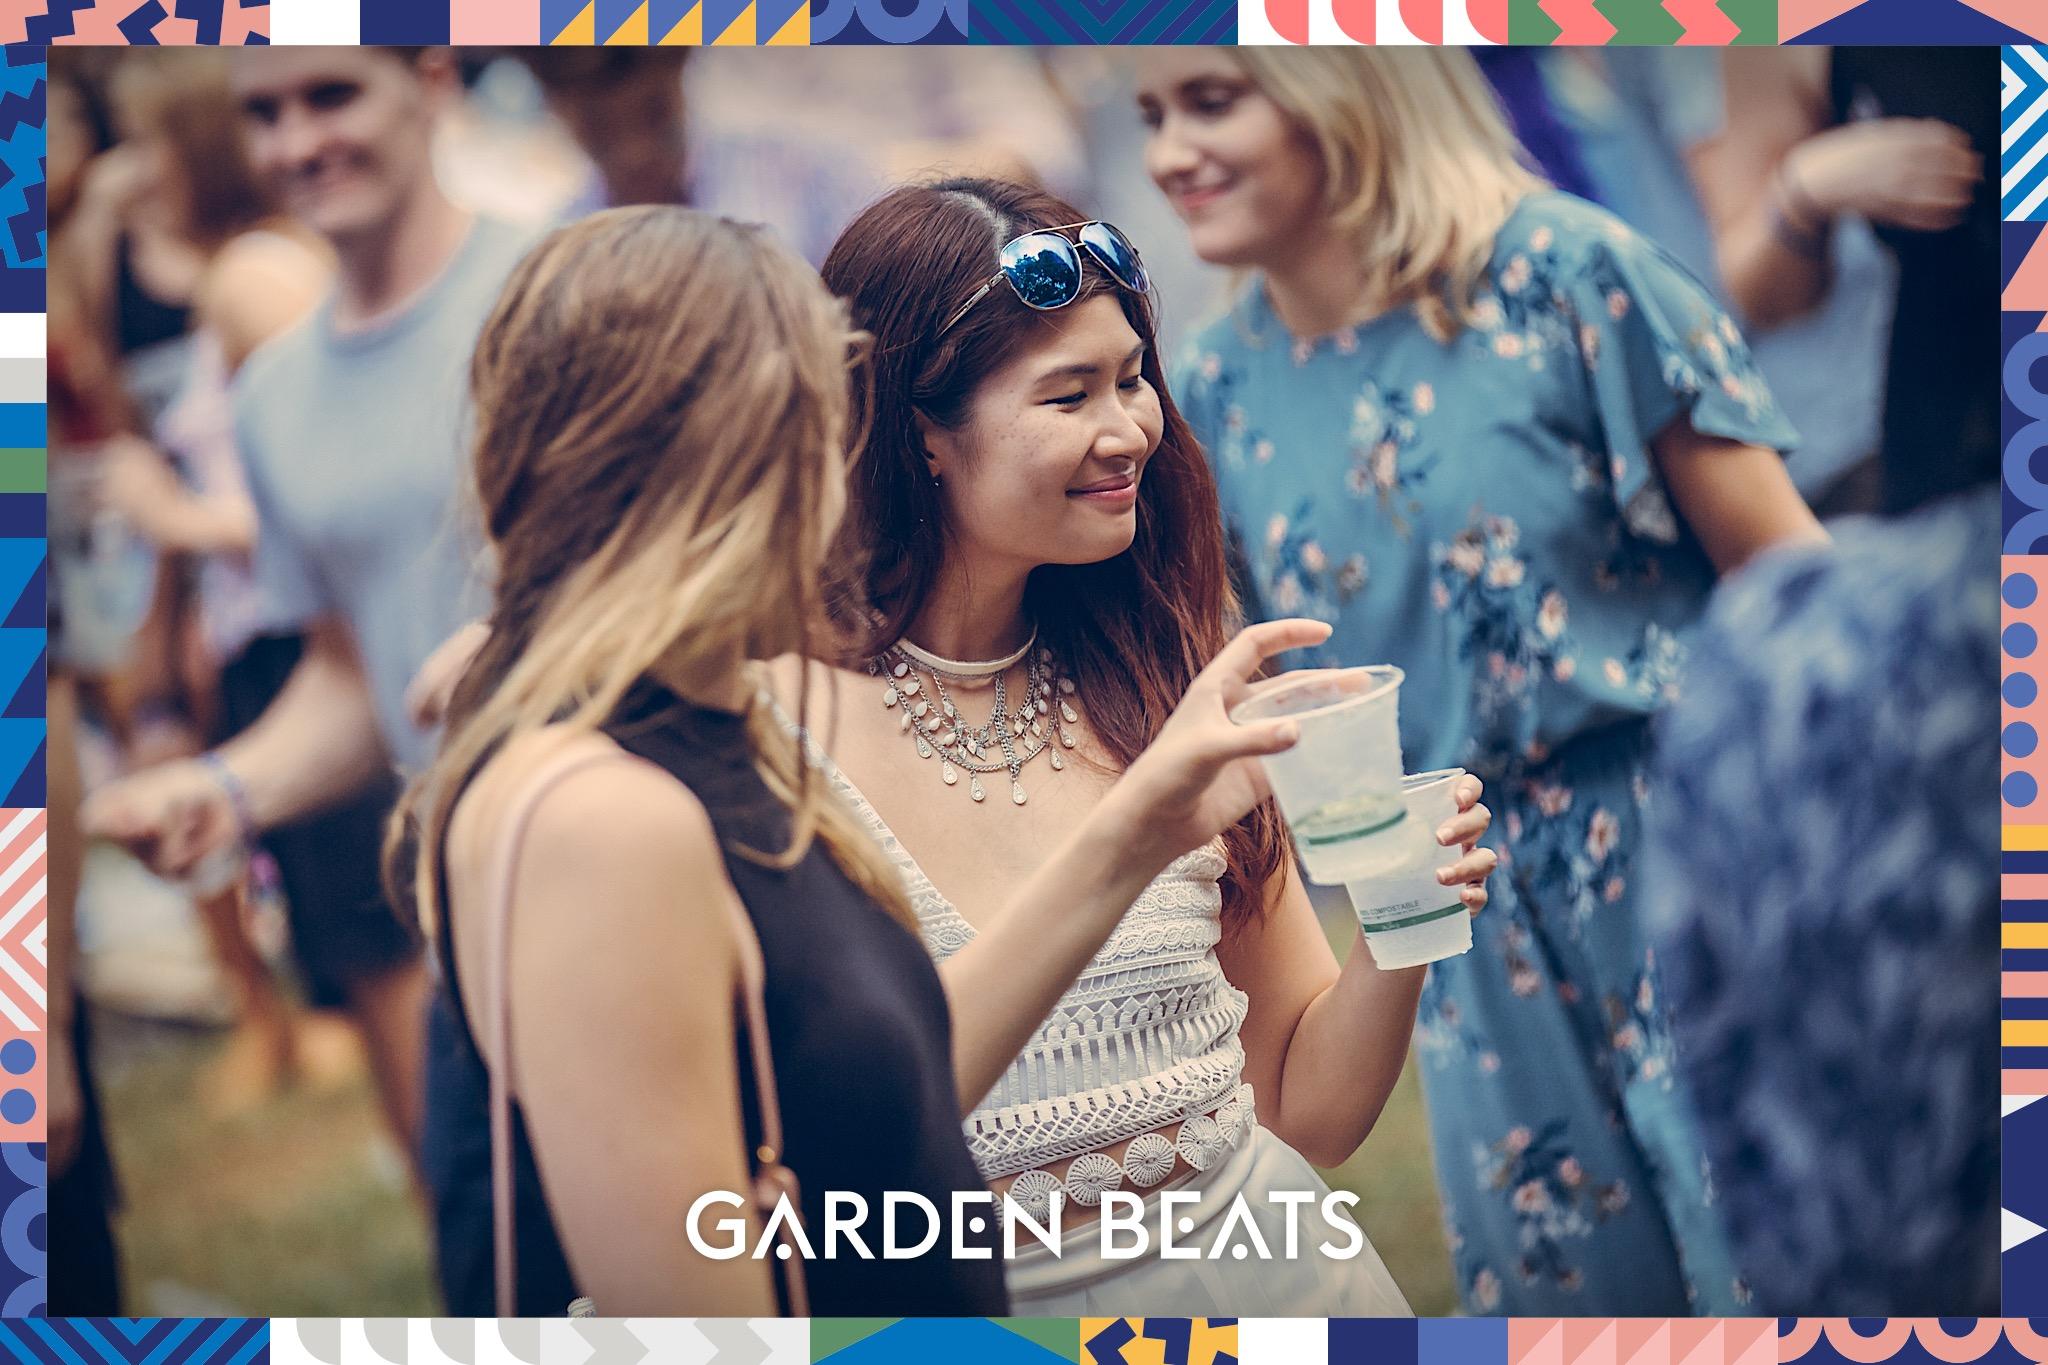 03032018_GardenBeats_Colossal592_Watermarked.jpg